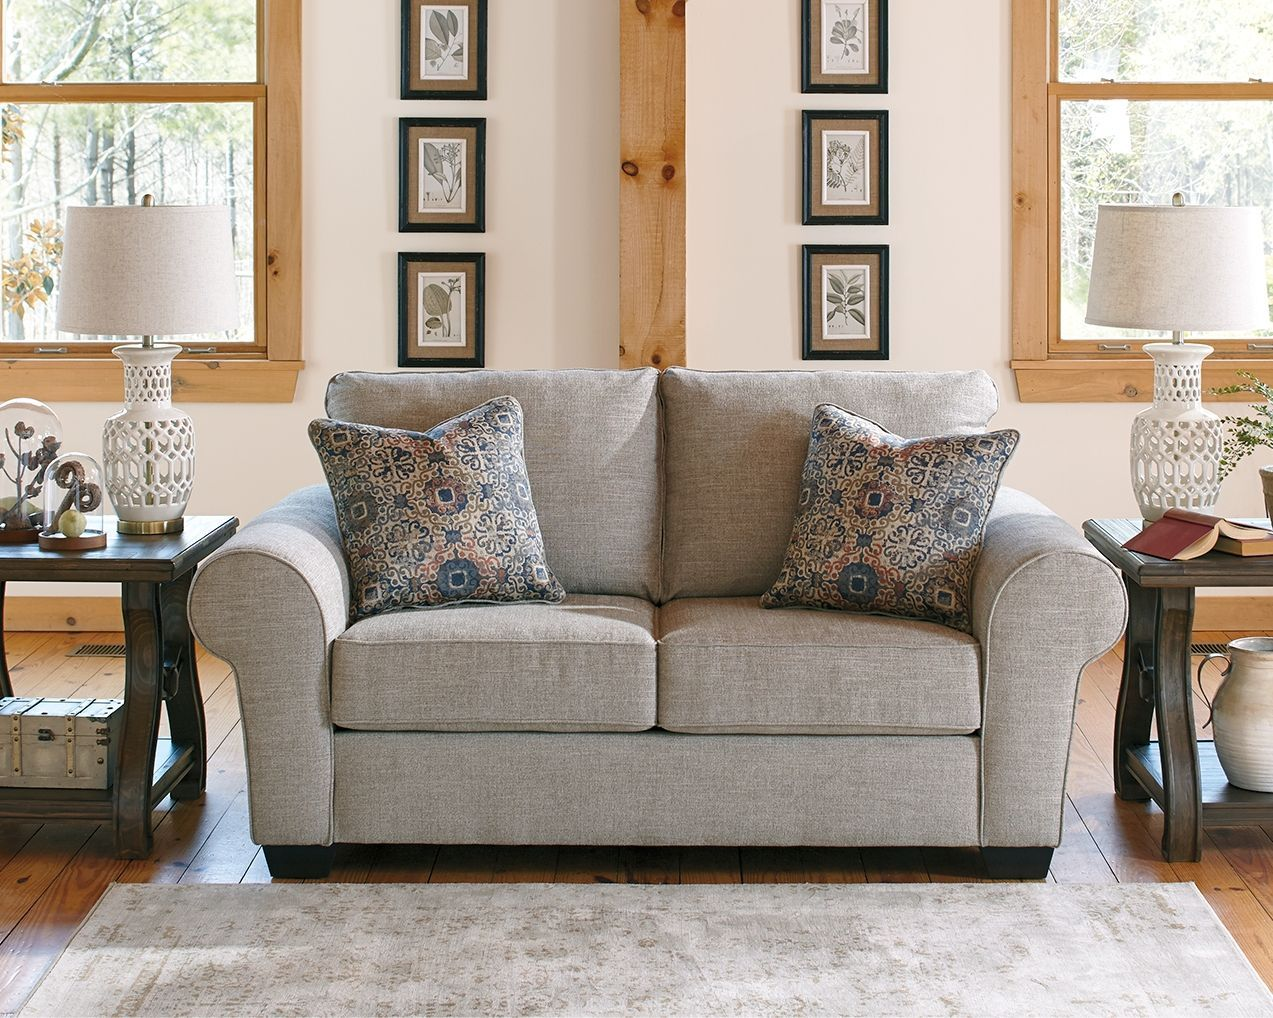 Surprising 9 Stunning Useful Ideas Decorative Pillows Pink Bedrooms Evergreenethics Interior Chair Design Evergreenethicsorg